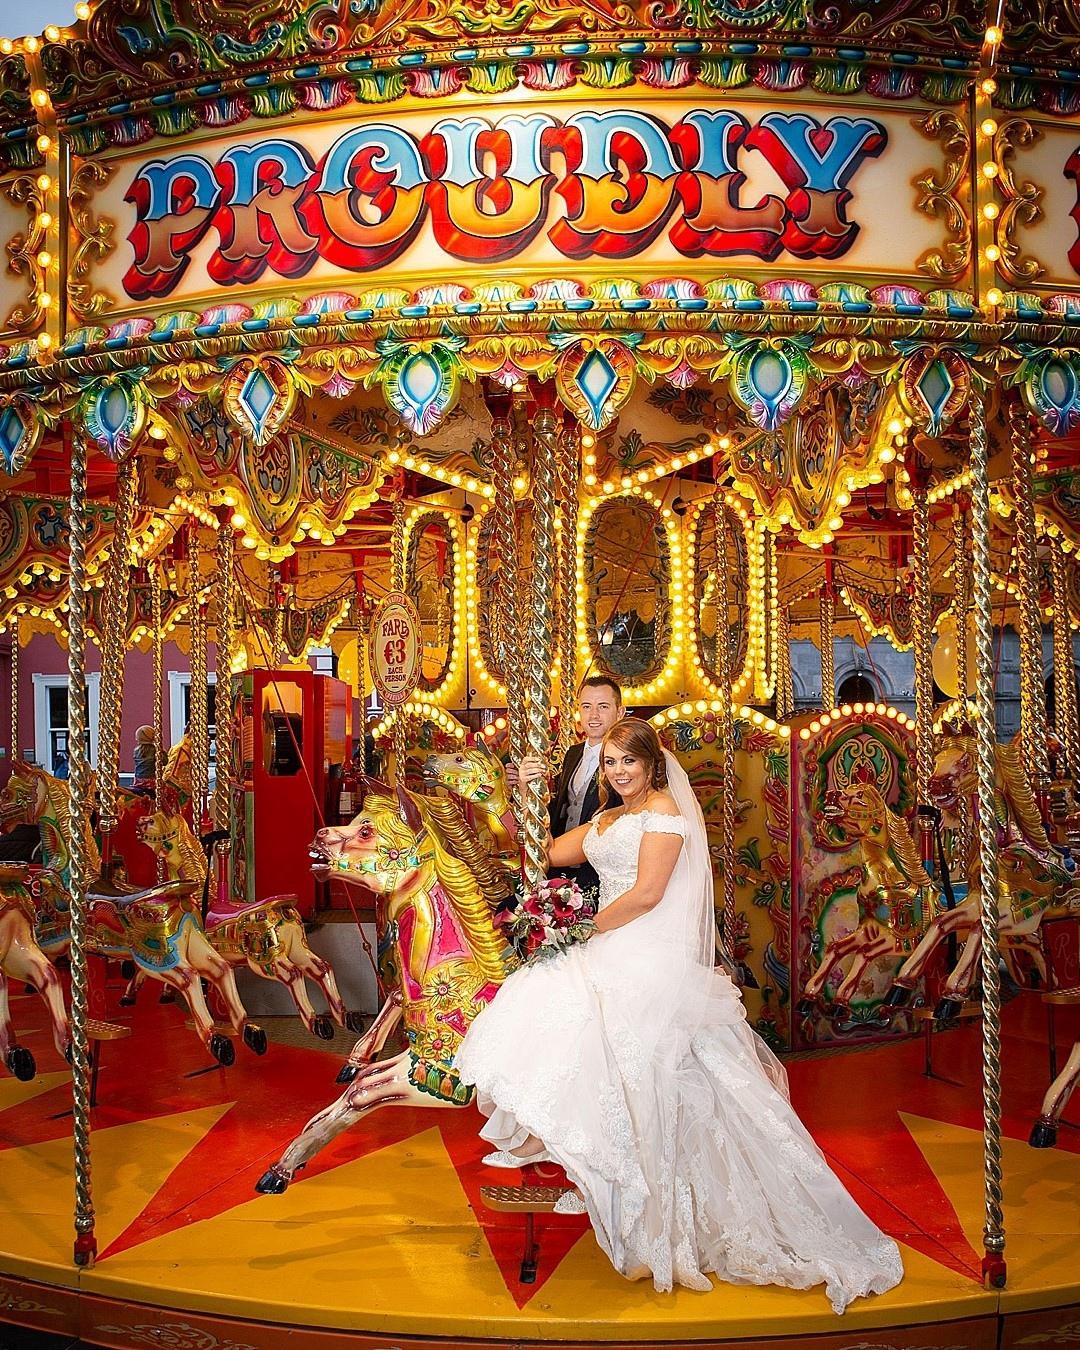 duffy photography carousel